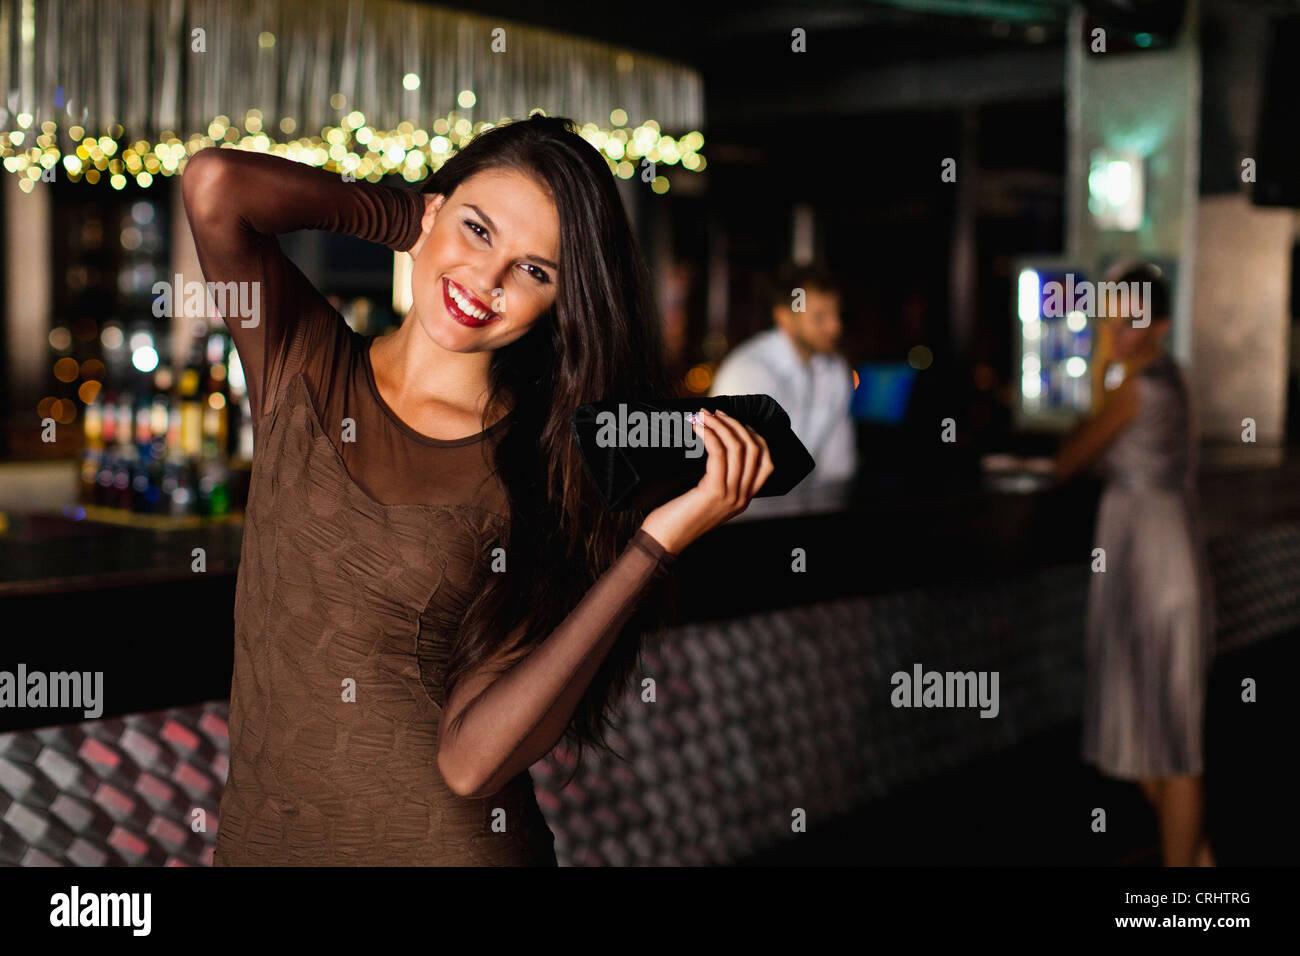 Lächelnde Frau in bar stehend Stockbild